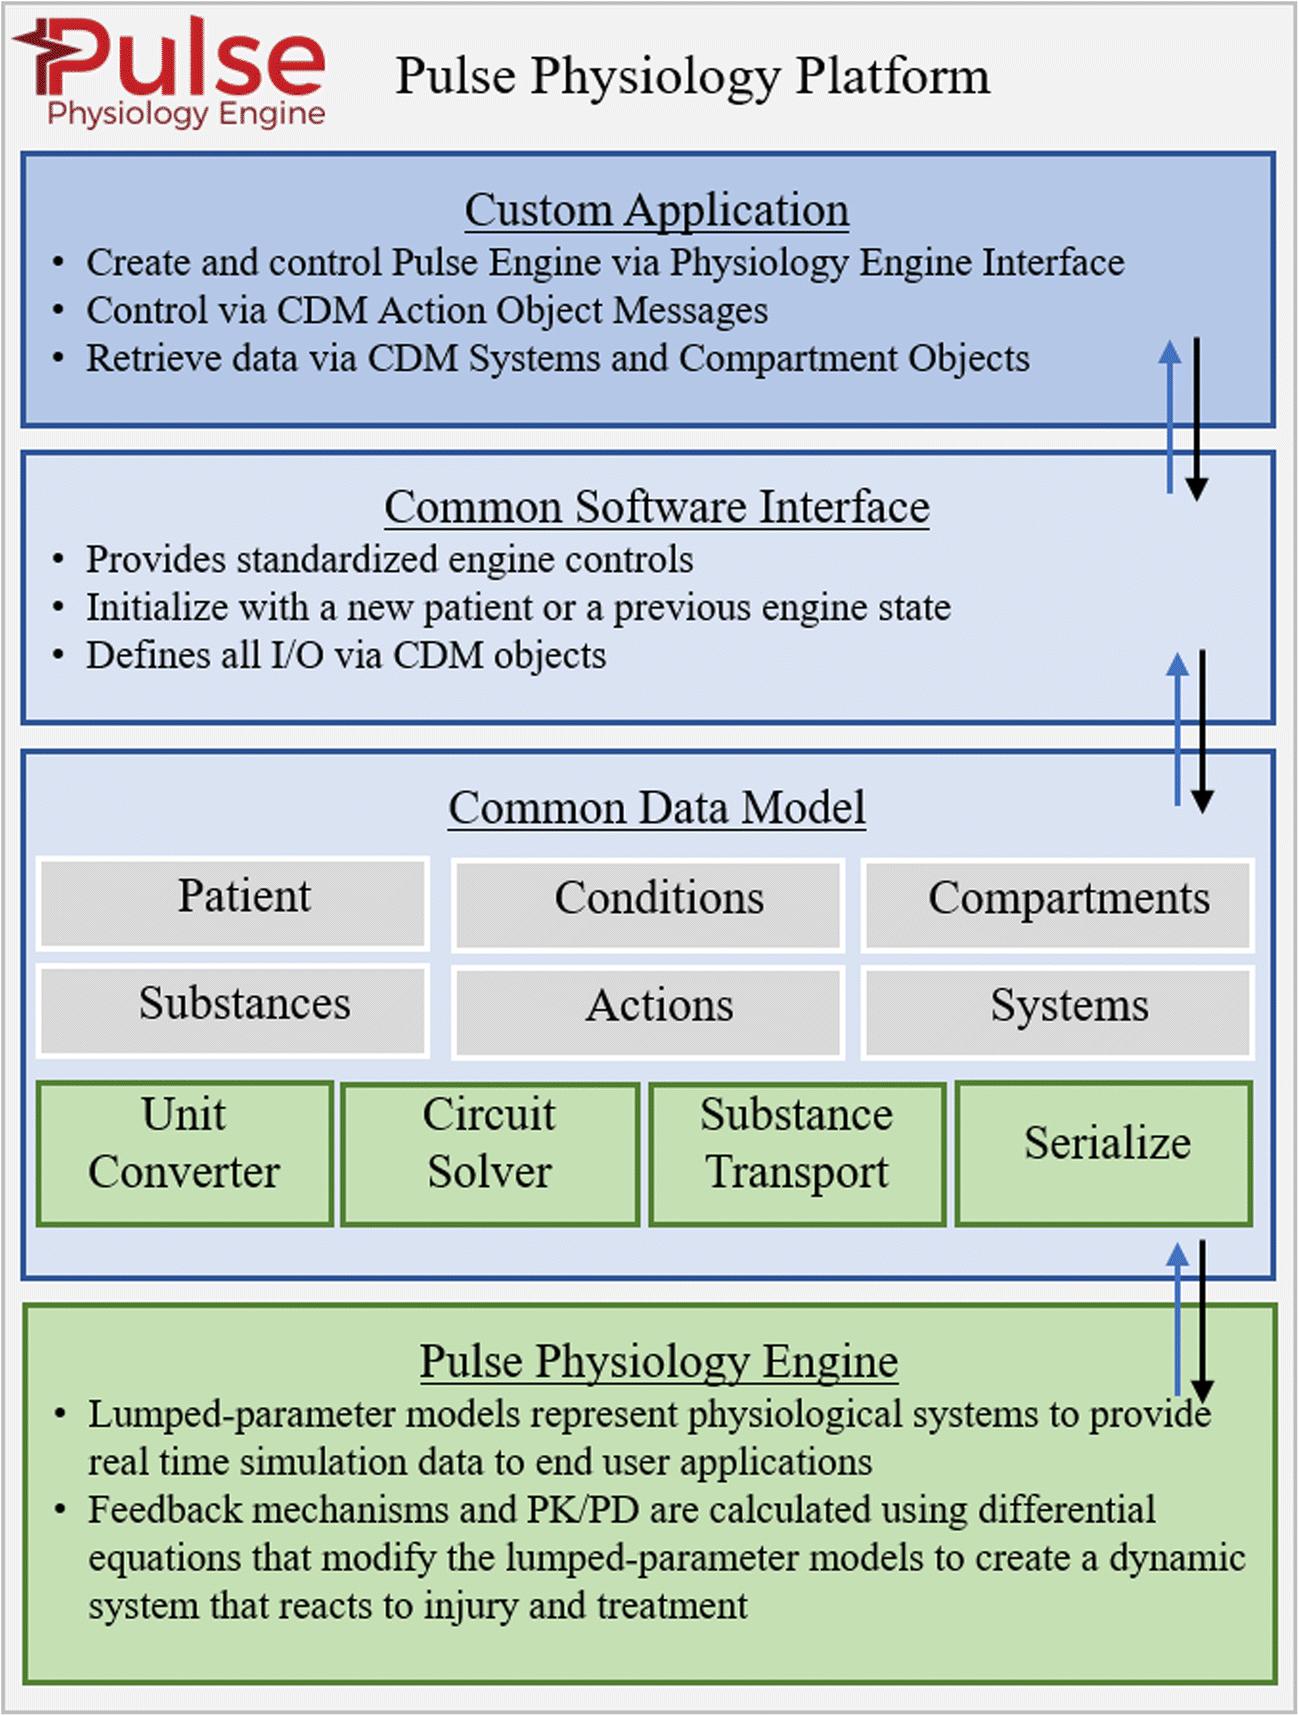 Pulse Physiology Engine: an Open-Source Software Platform